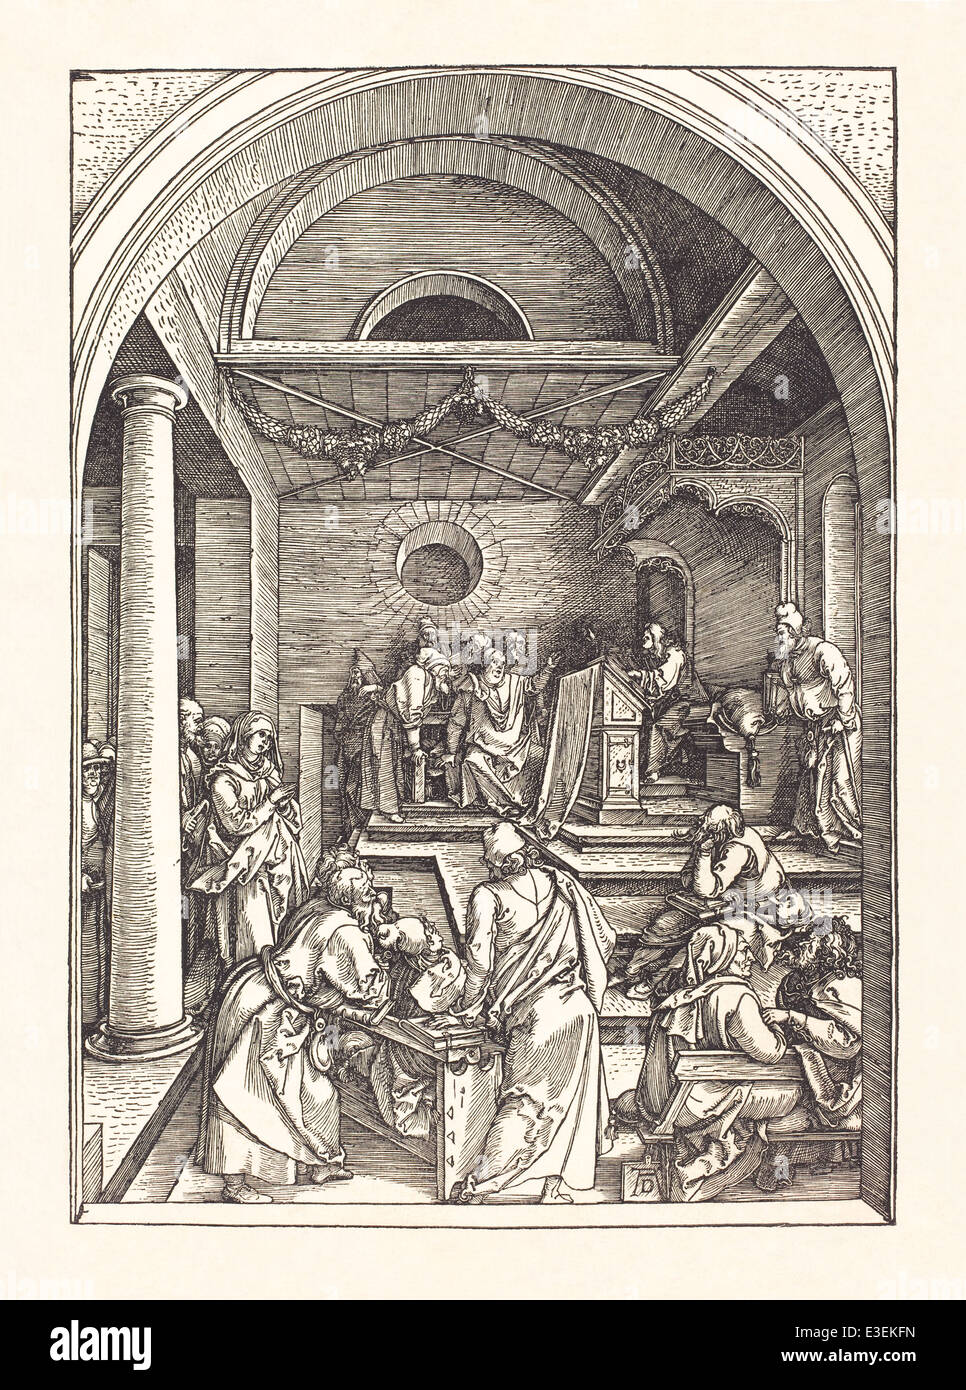 "Albrecht Dürer (1471-1528) Holzschnitt Darstellung ""Christus mitten unter den Lehrern im Tempel"" Stockbild"